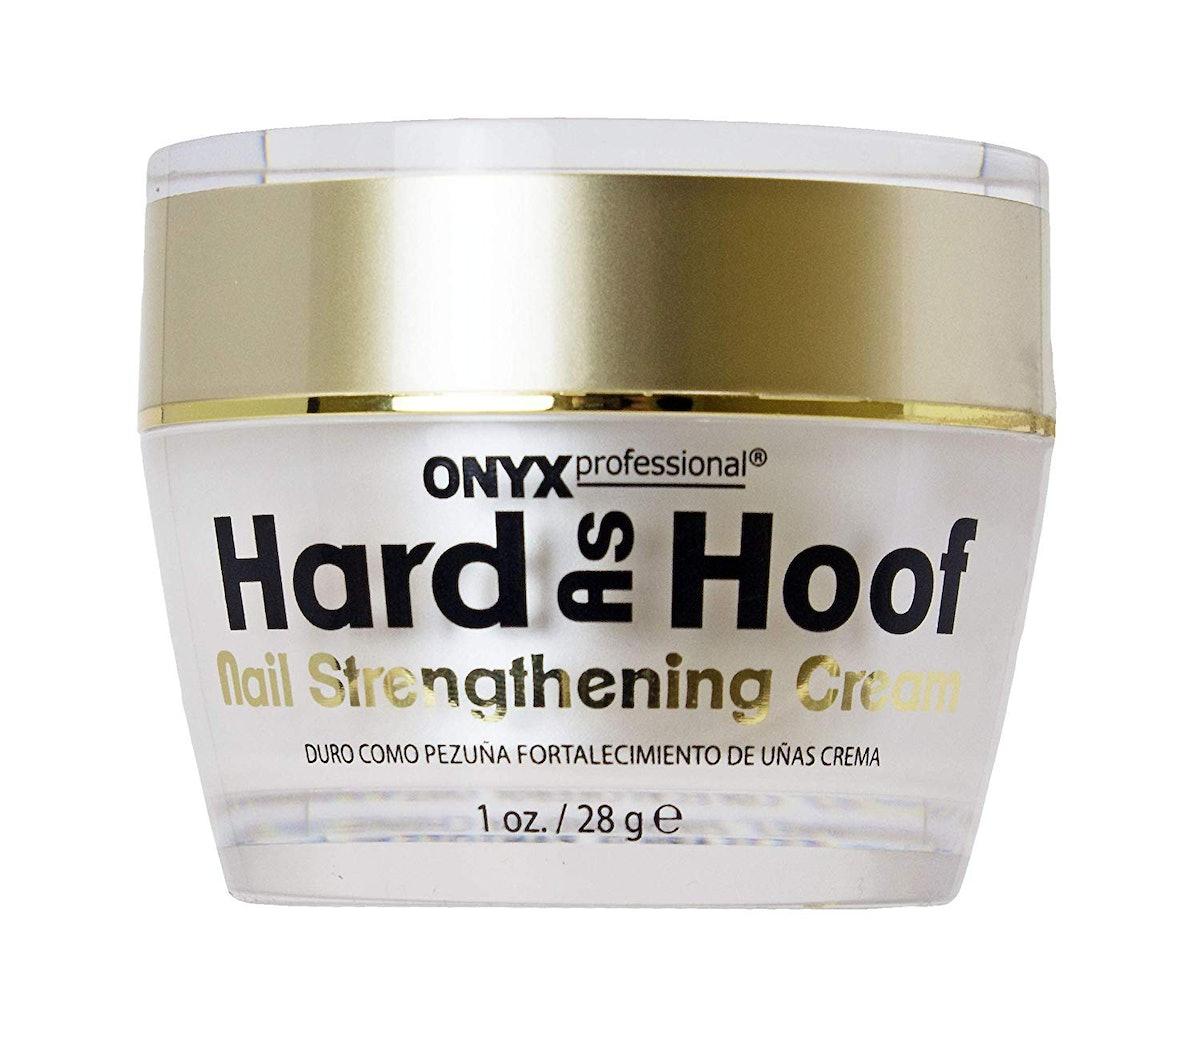 ONYX Professional Hard As Hoof Nail Strengthening Cream